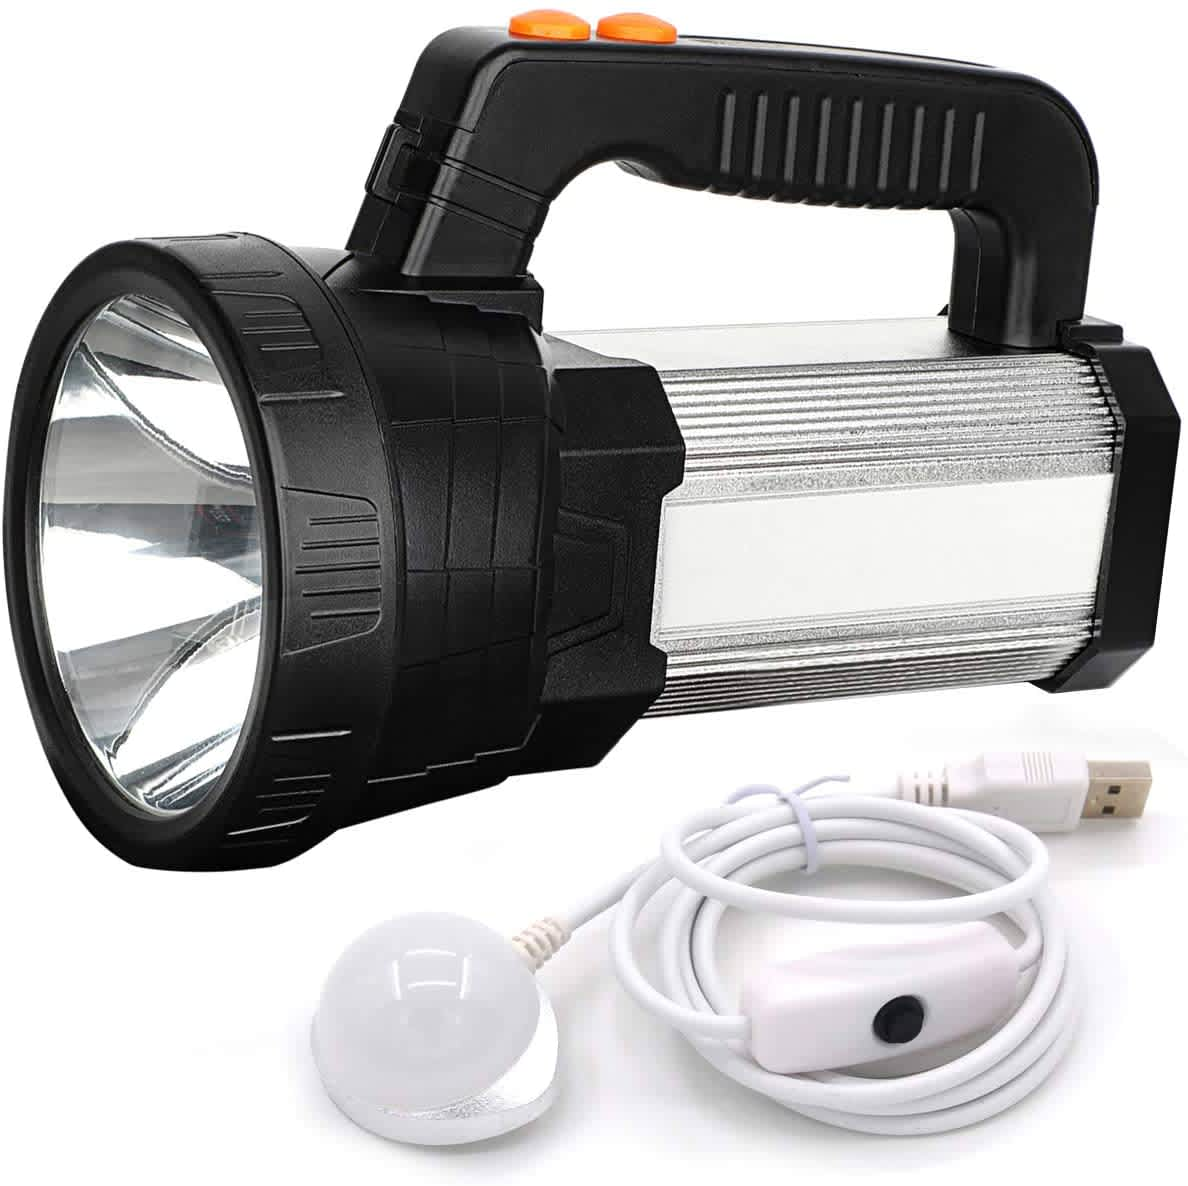 BigSun USB Rechargeable LED Flashlight